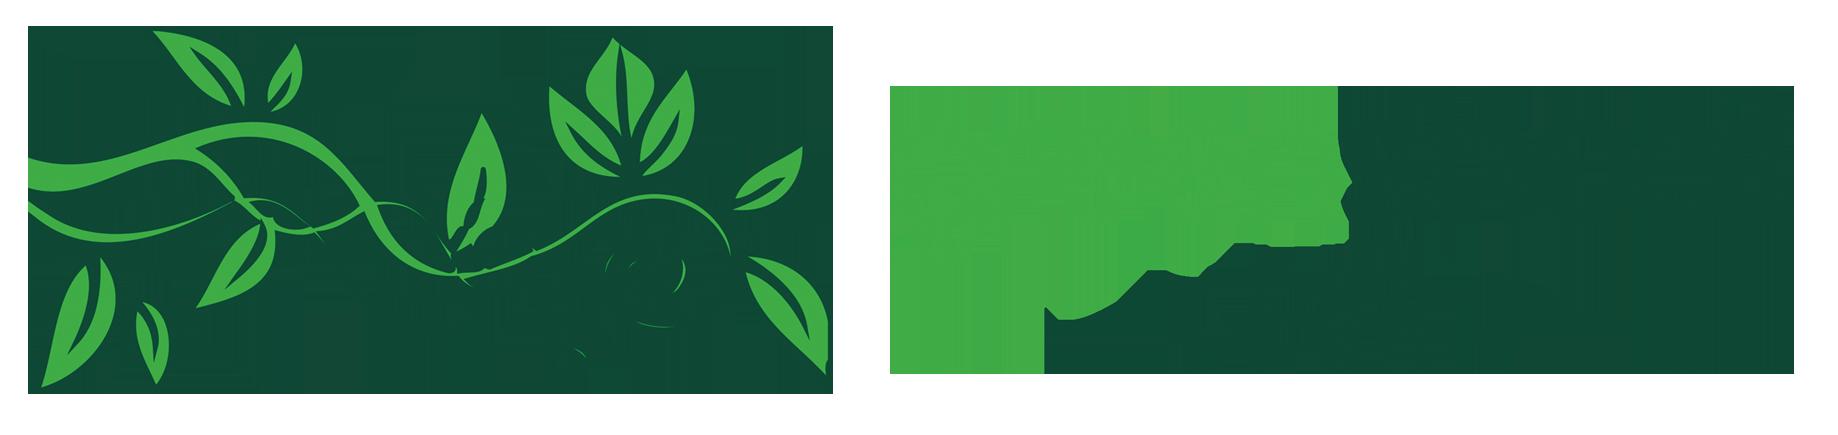 GreenshootLogoLandscape